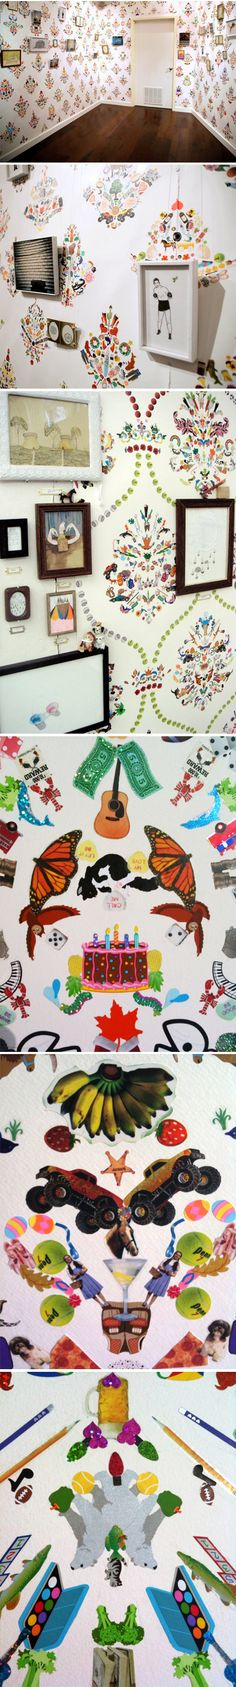 Sticker Wallpaper installations by Payton Turner & Brian Kaspr via The Jealous Curator// fantastic installation!